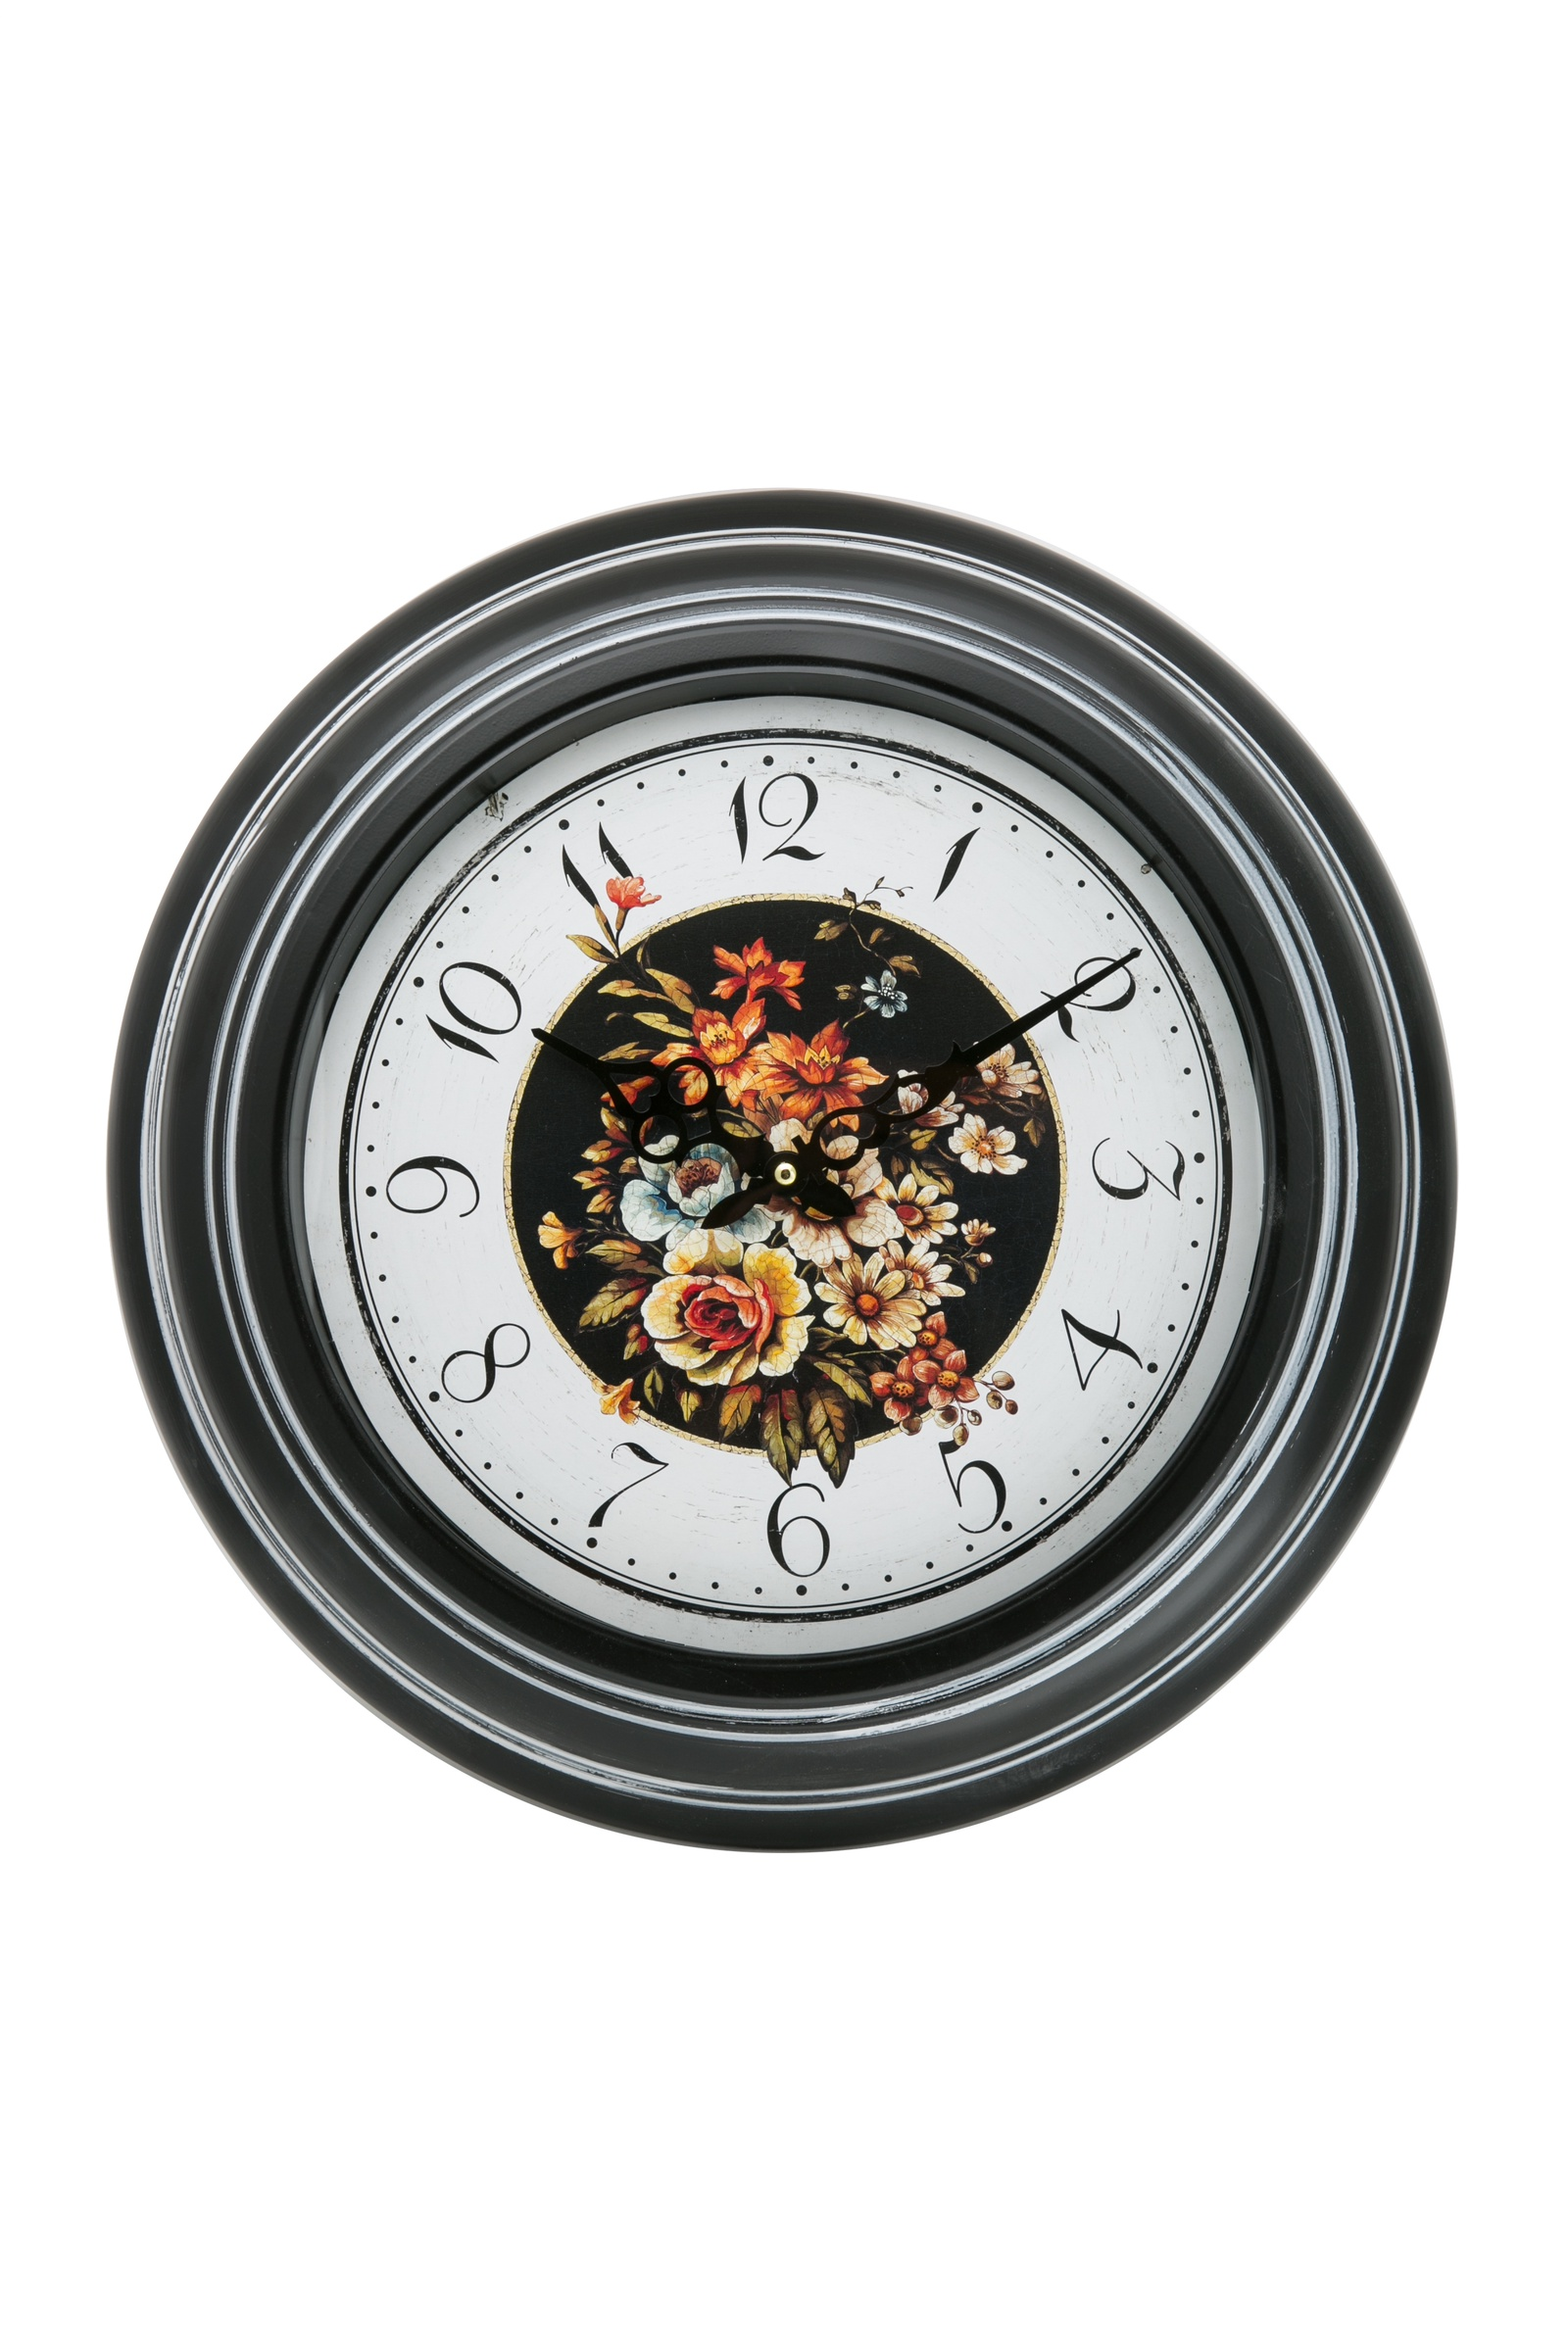 Настенные часы Mitya Veselkov NAST цена и фото